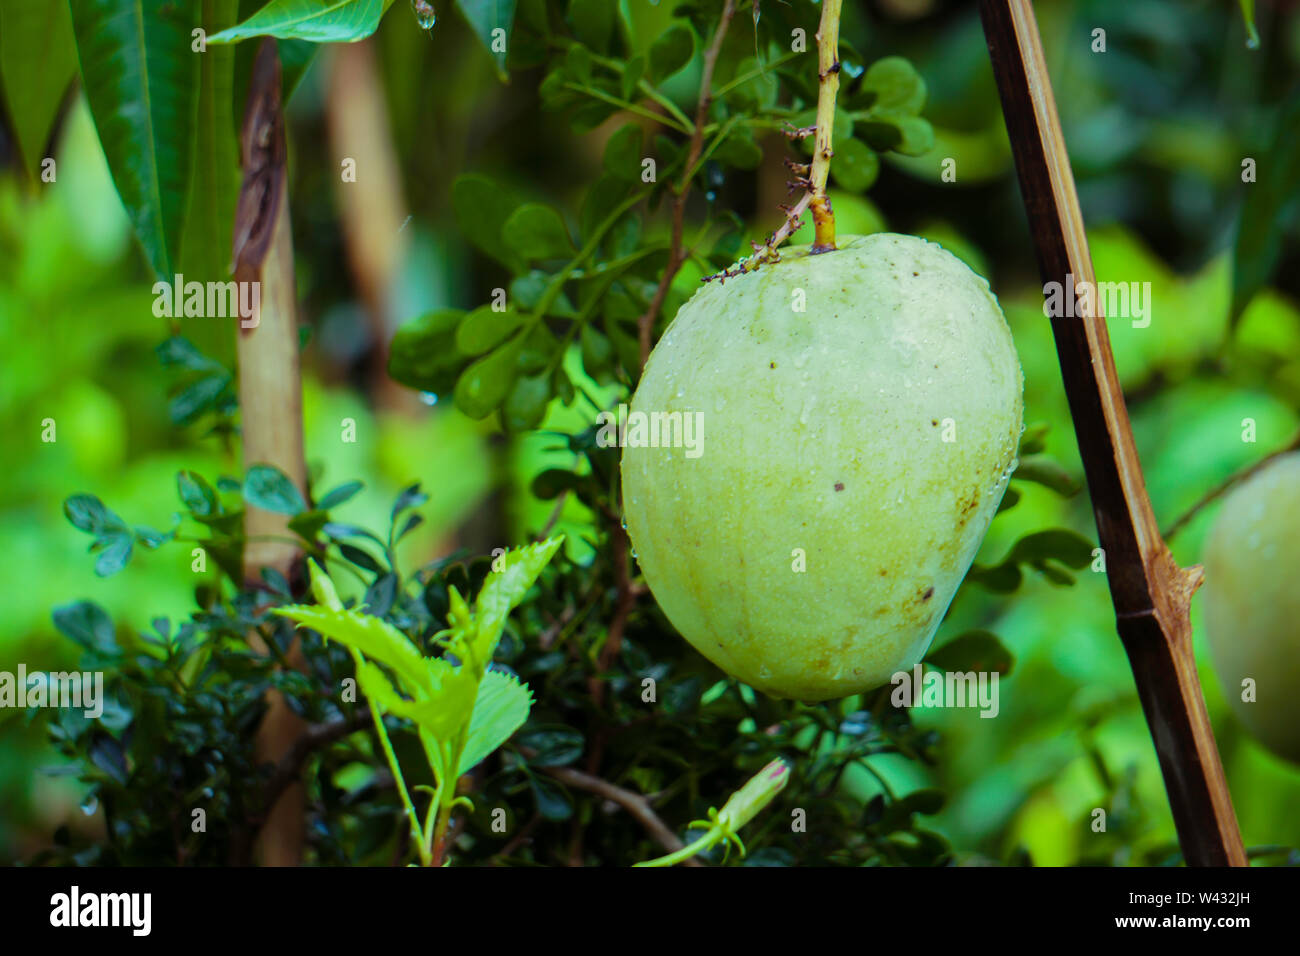 Fresh all season Bangladeshi Mango tree, Himsagar or Himshagar mango tree - Stock Image